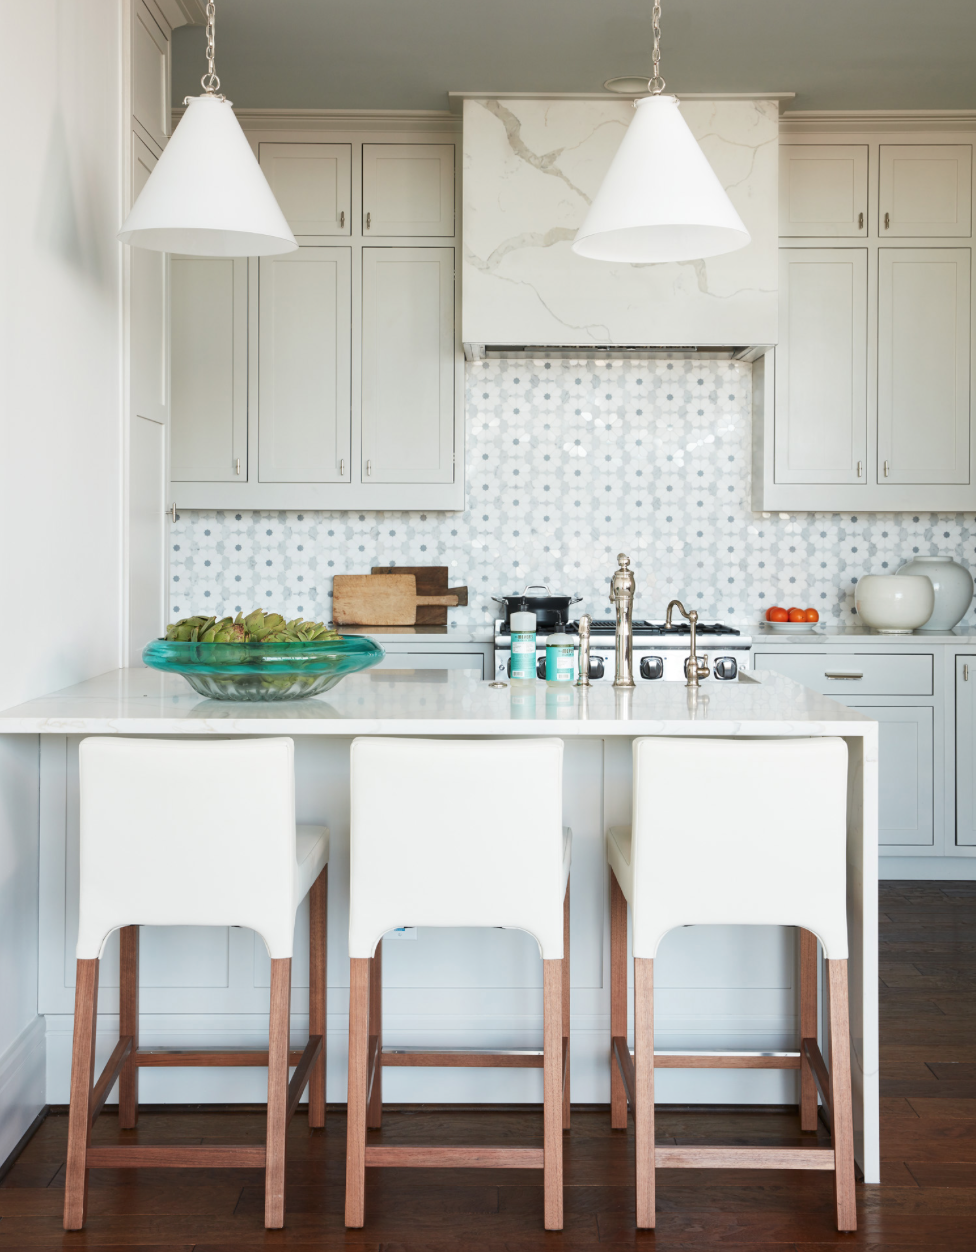 House Tour: Andrew J. Howard Interior Design | House tours, Kitchens ...